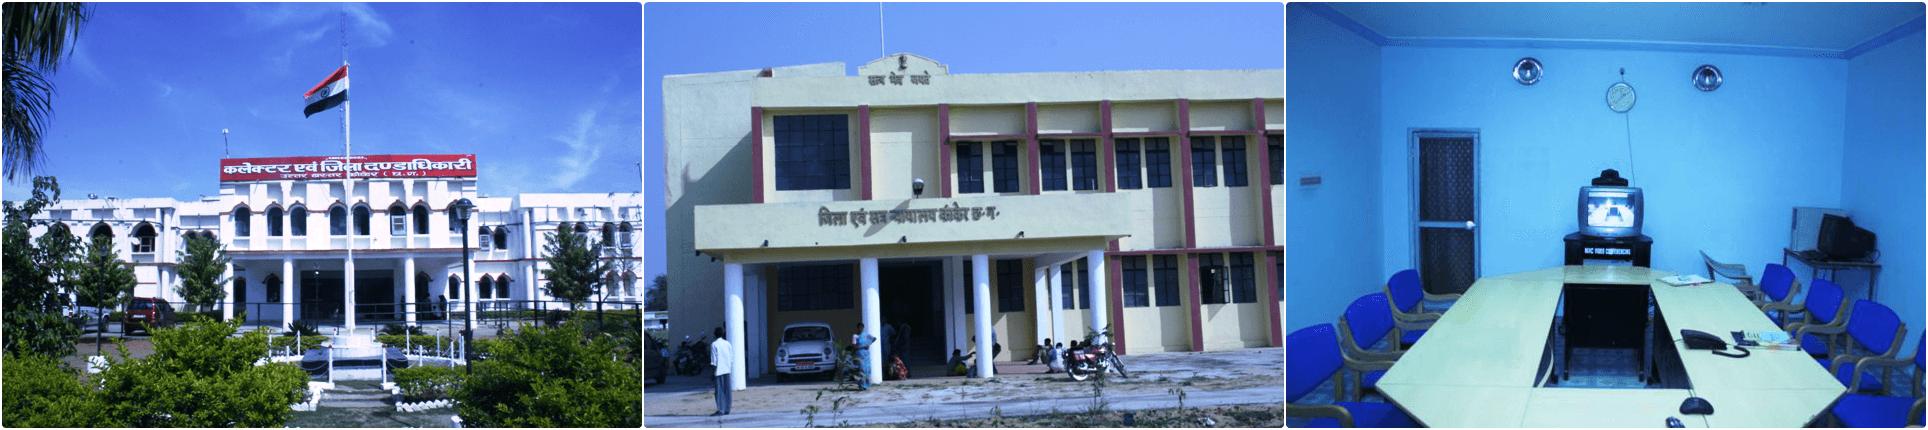 Kanker Official Campus